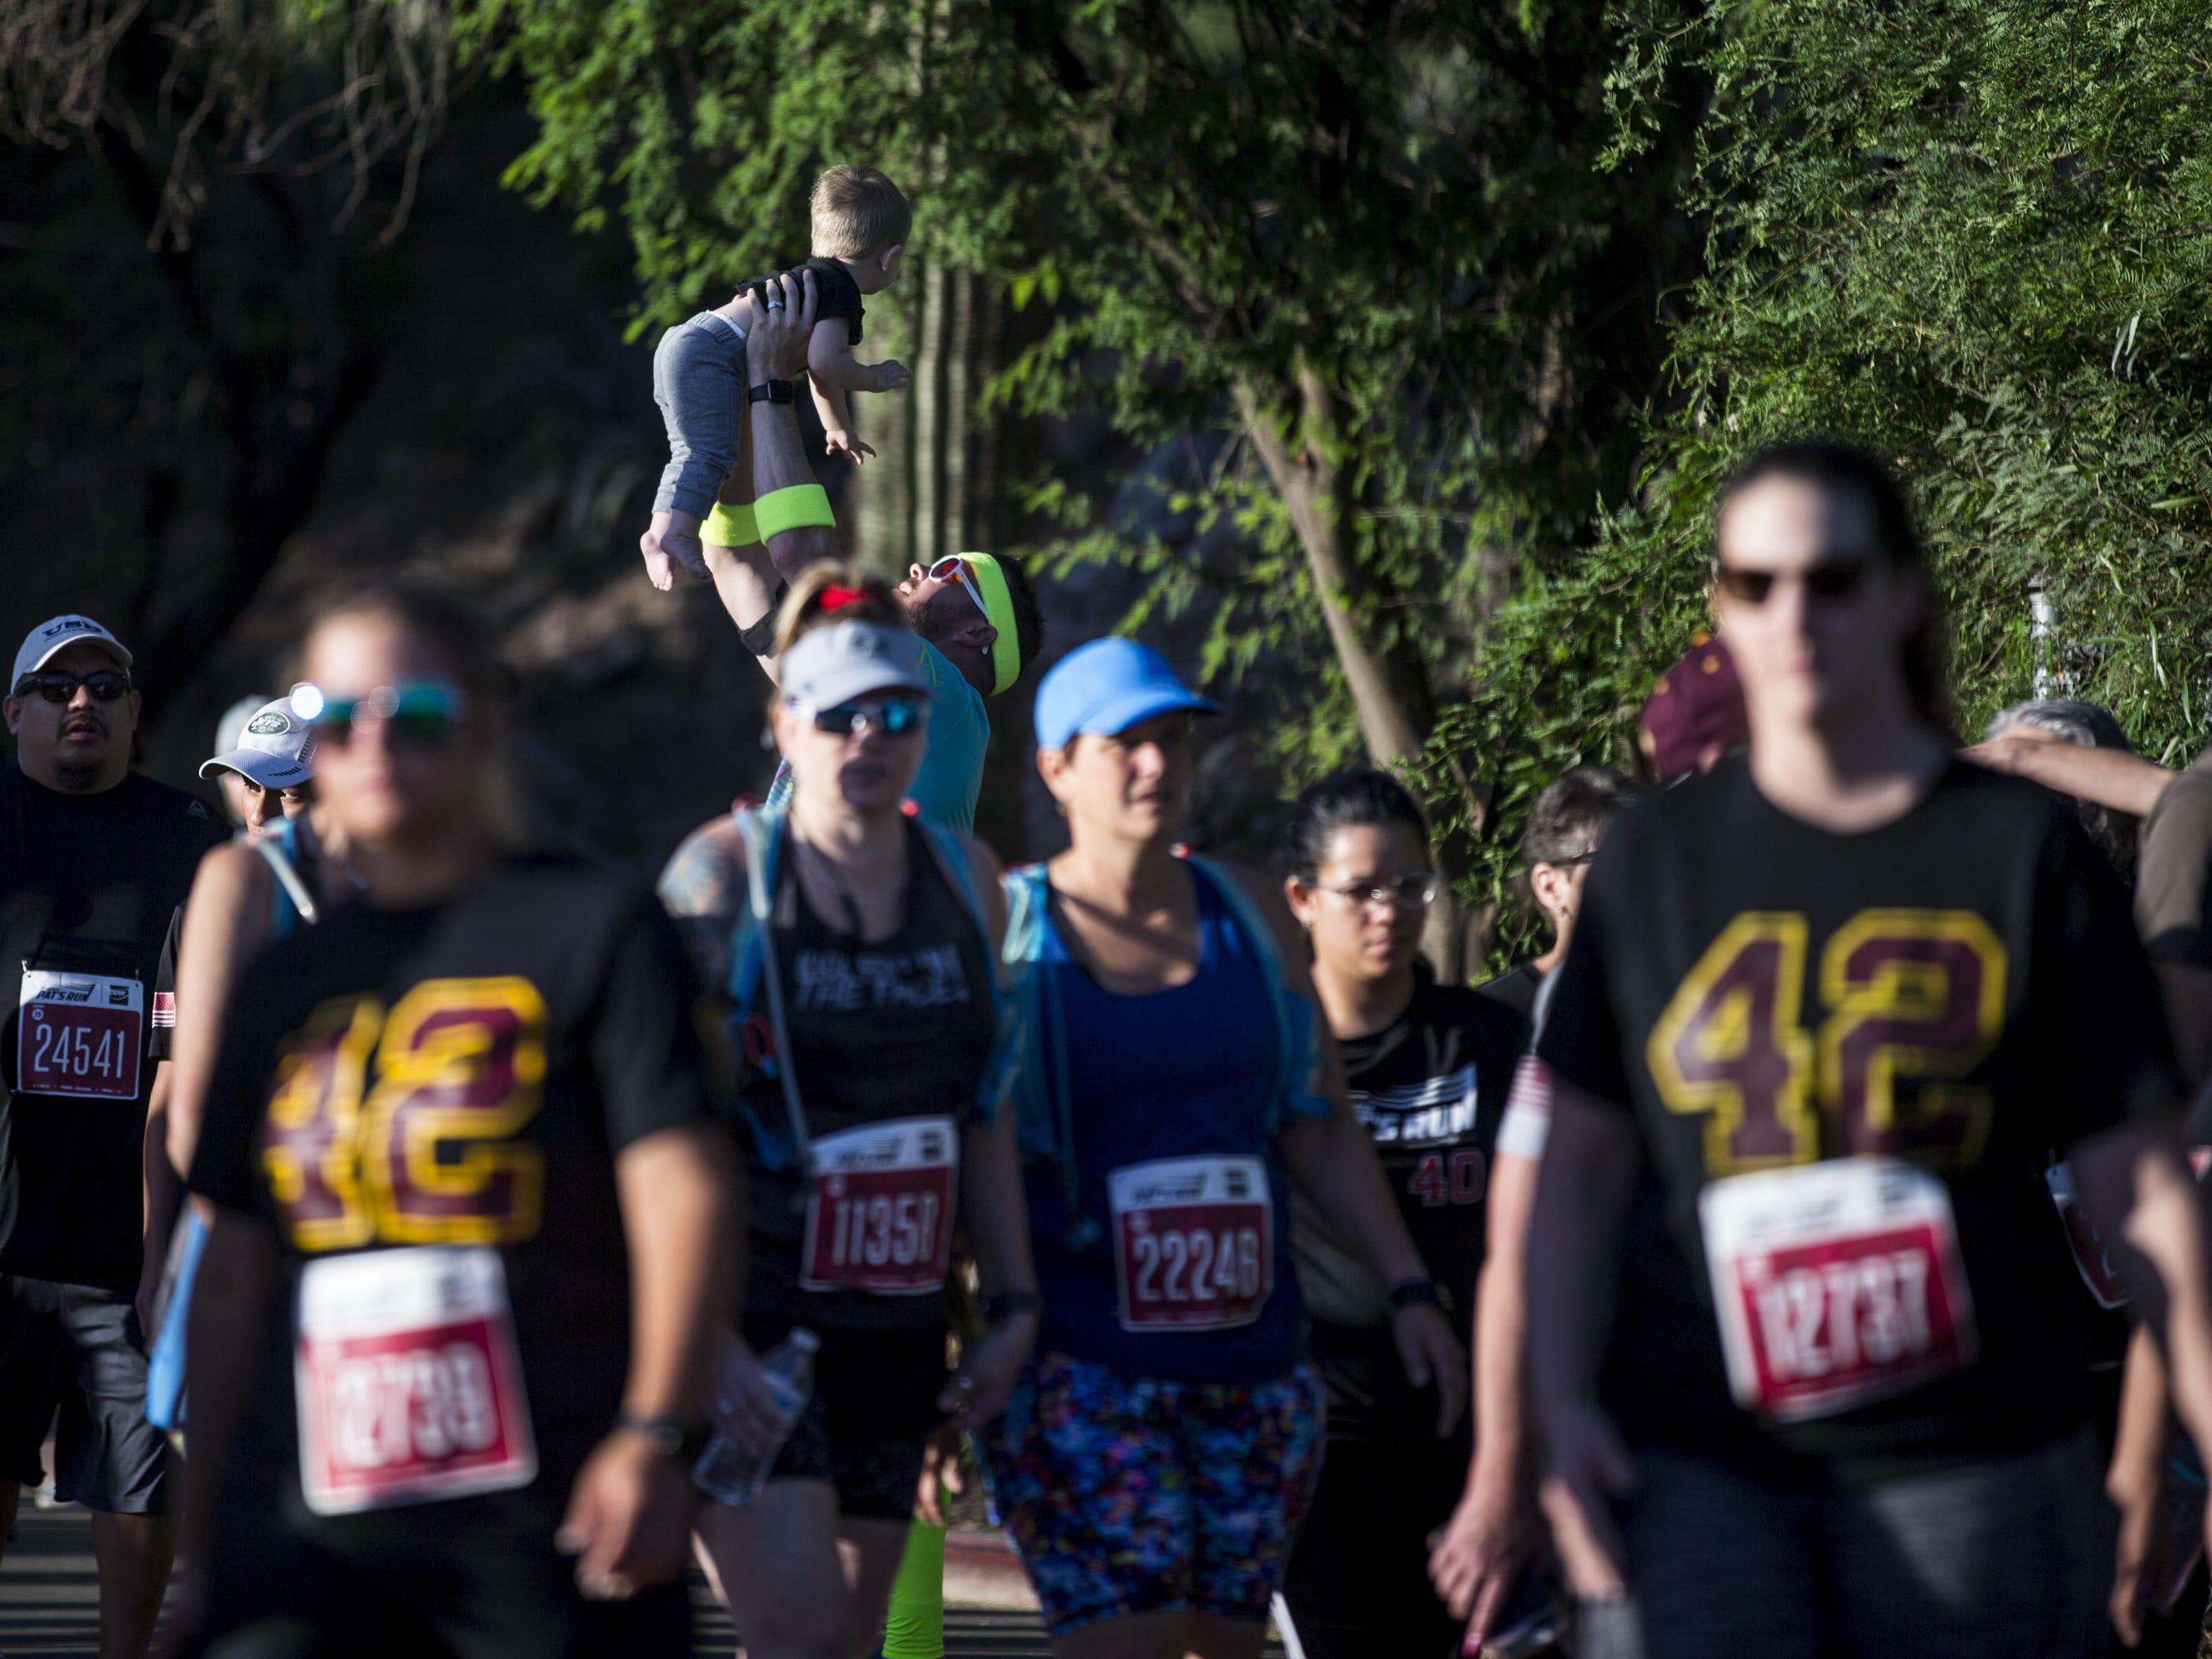 Participants arrive for the 15th Annual Pat's Run on Saturday, April 27, 2019, in Tempe, Ariz.